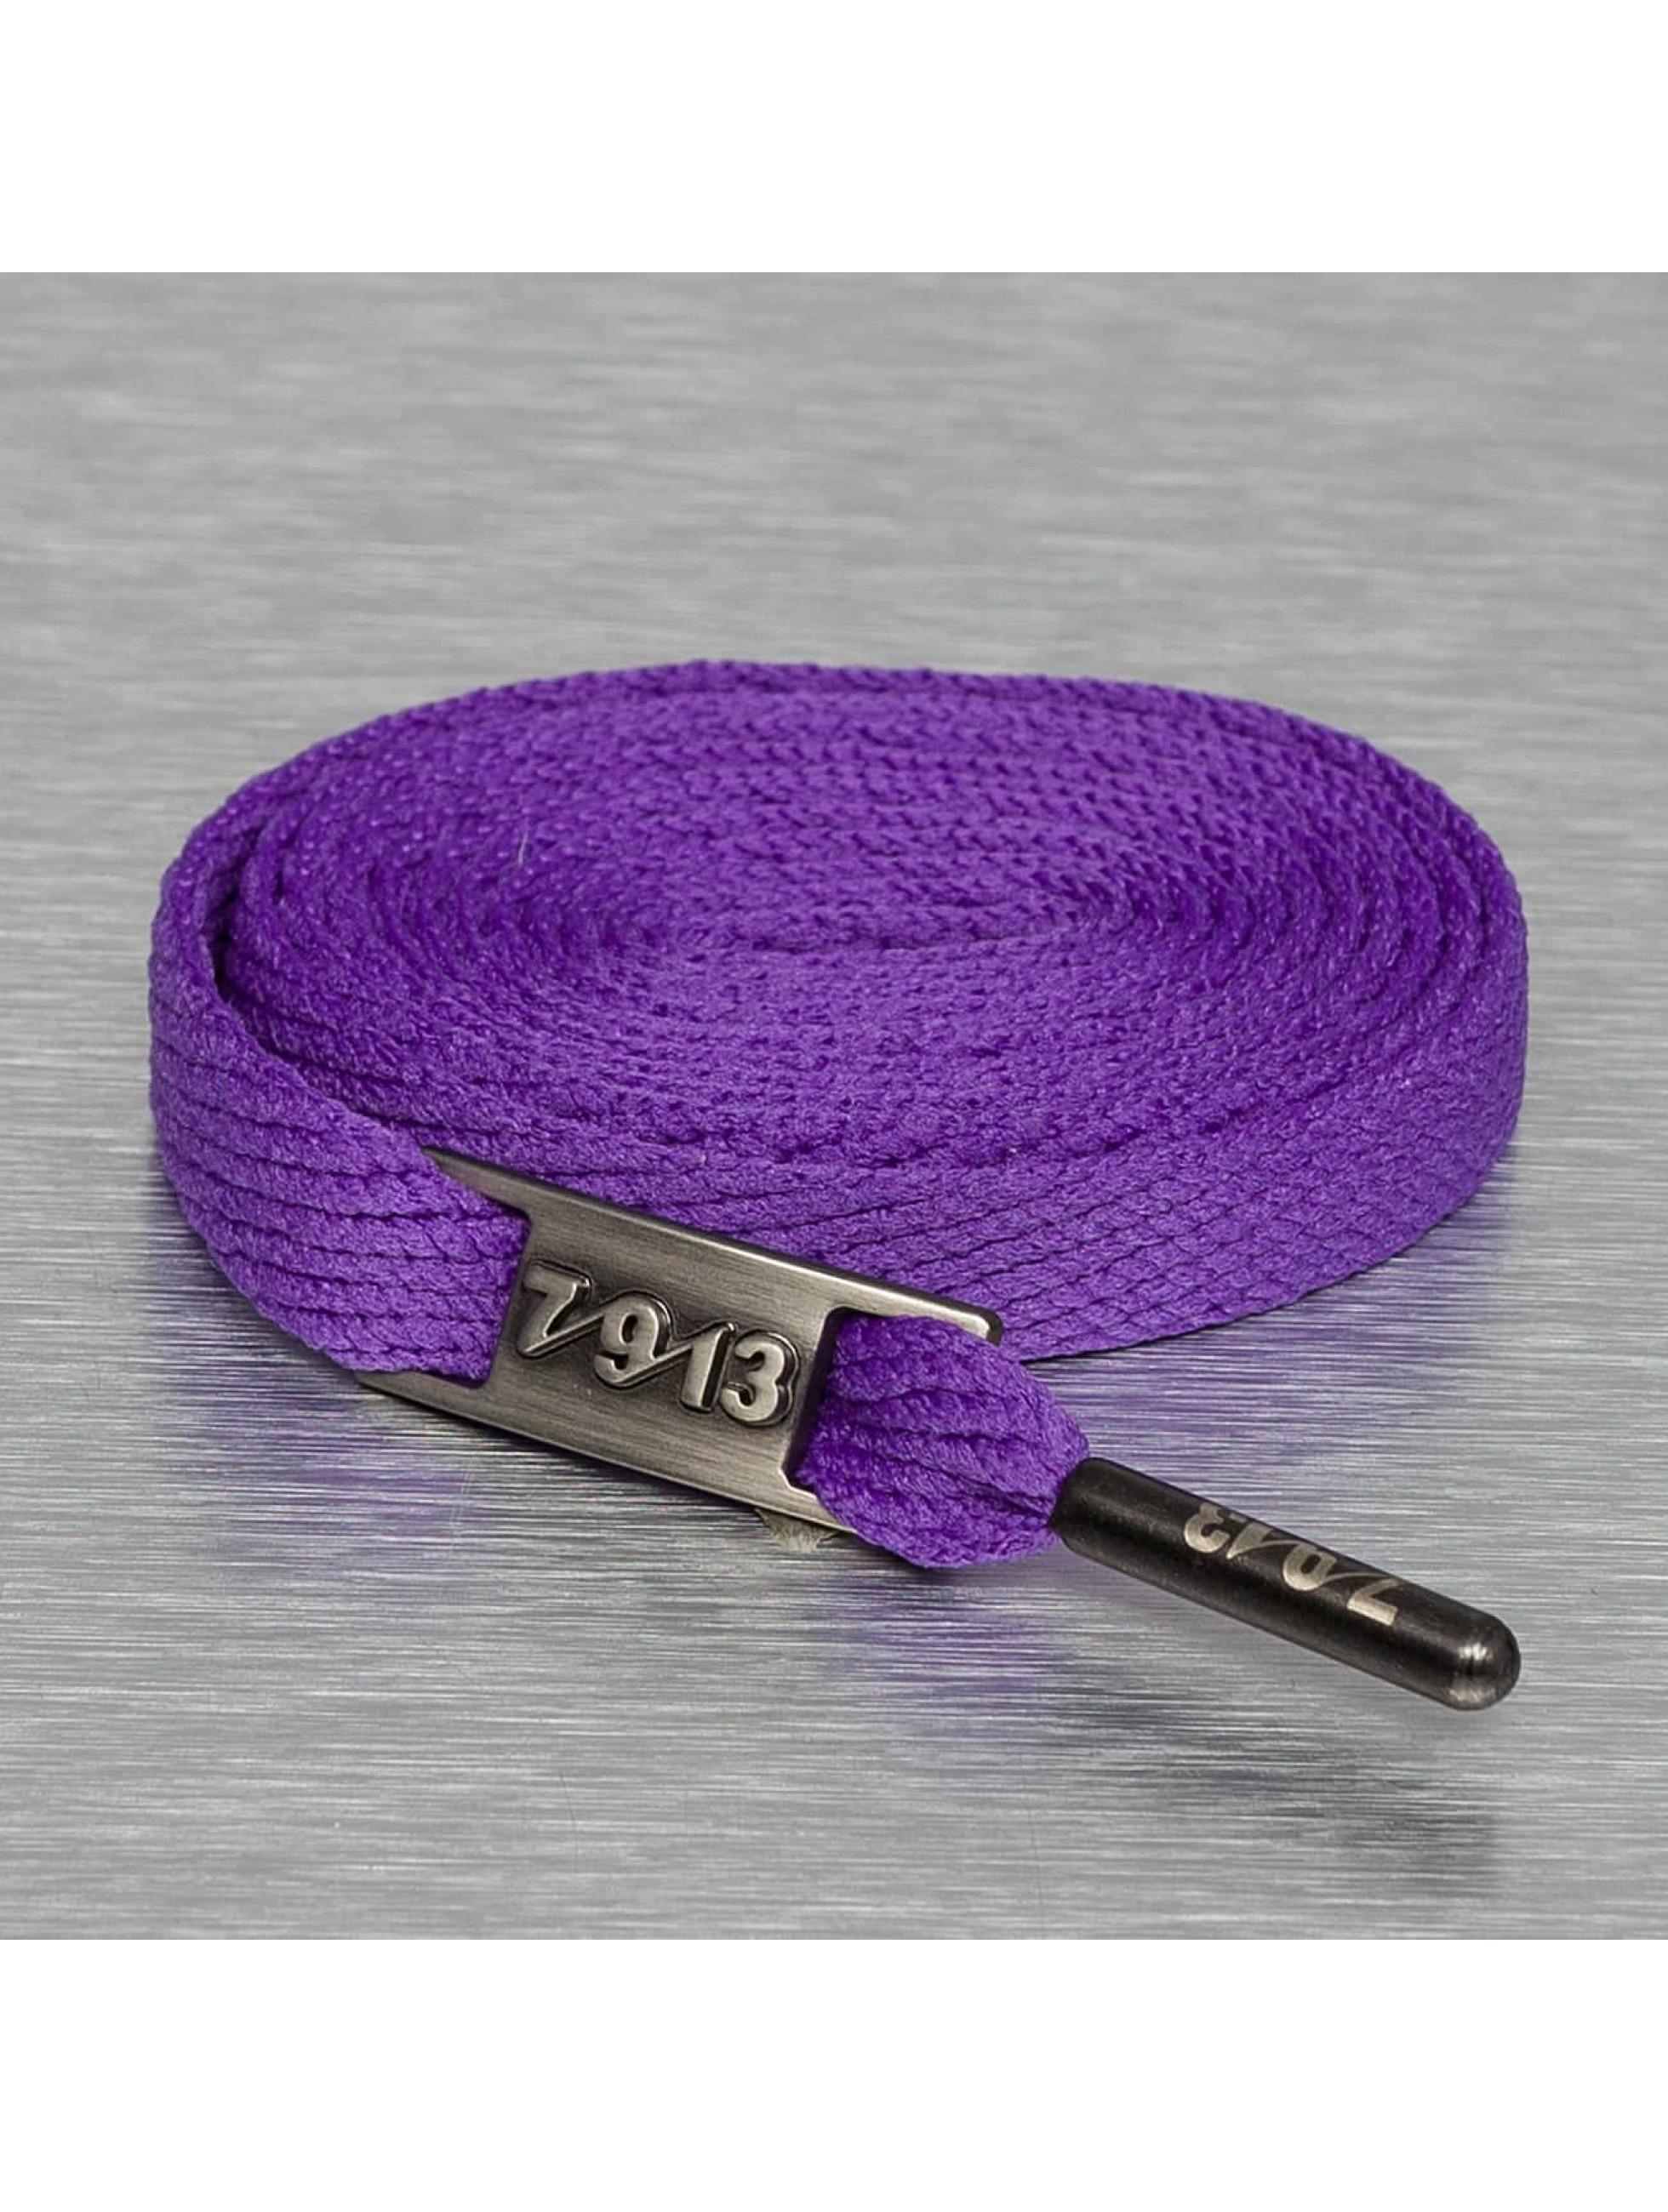 Seven Nine 13 Kengännauha Full Metal purpuranpunainen